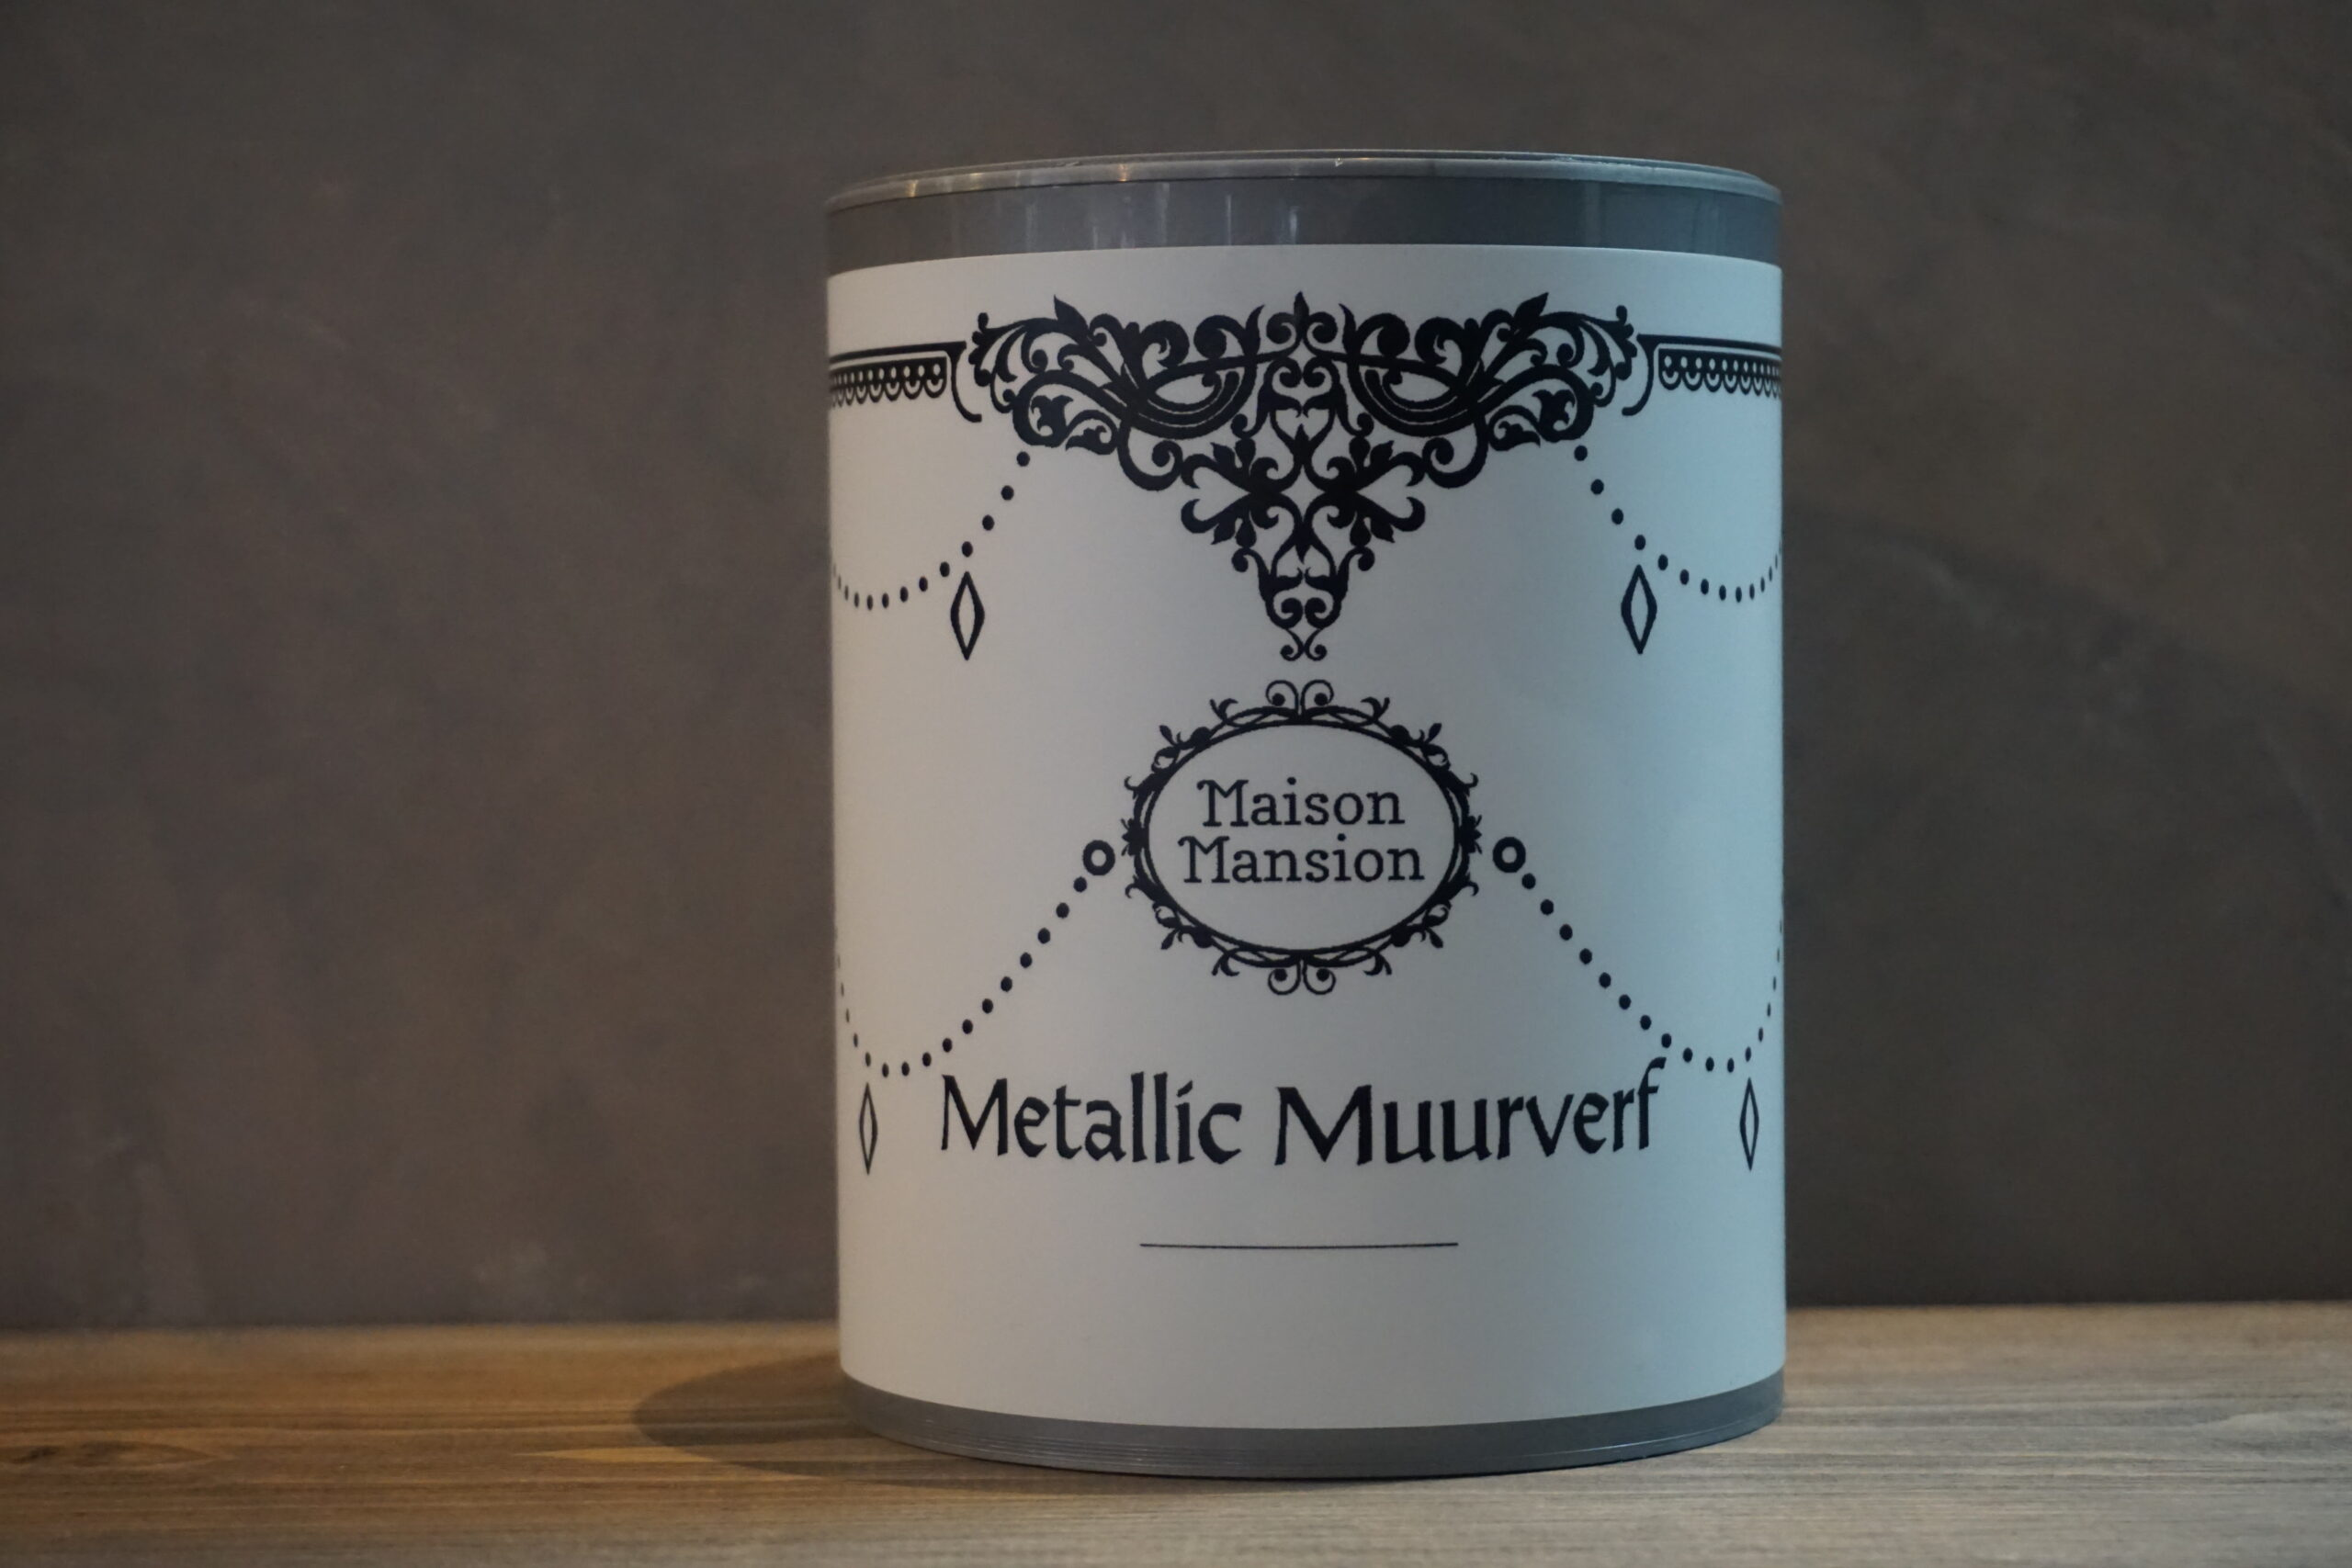 Metallic muurverf MaisonMansion